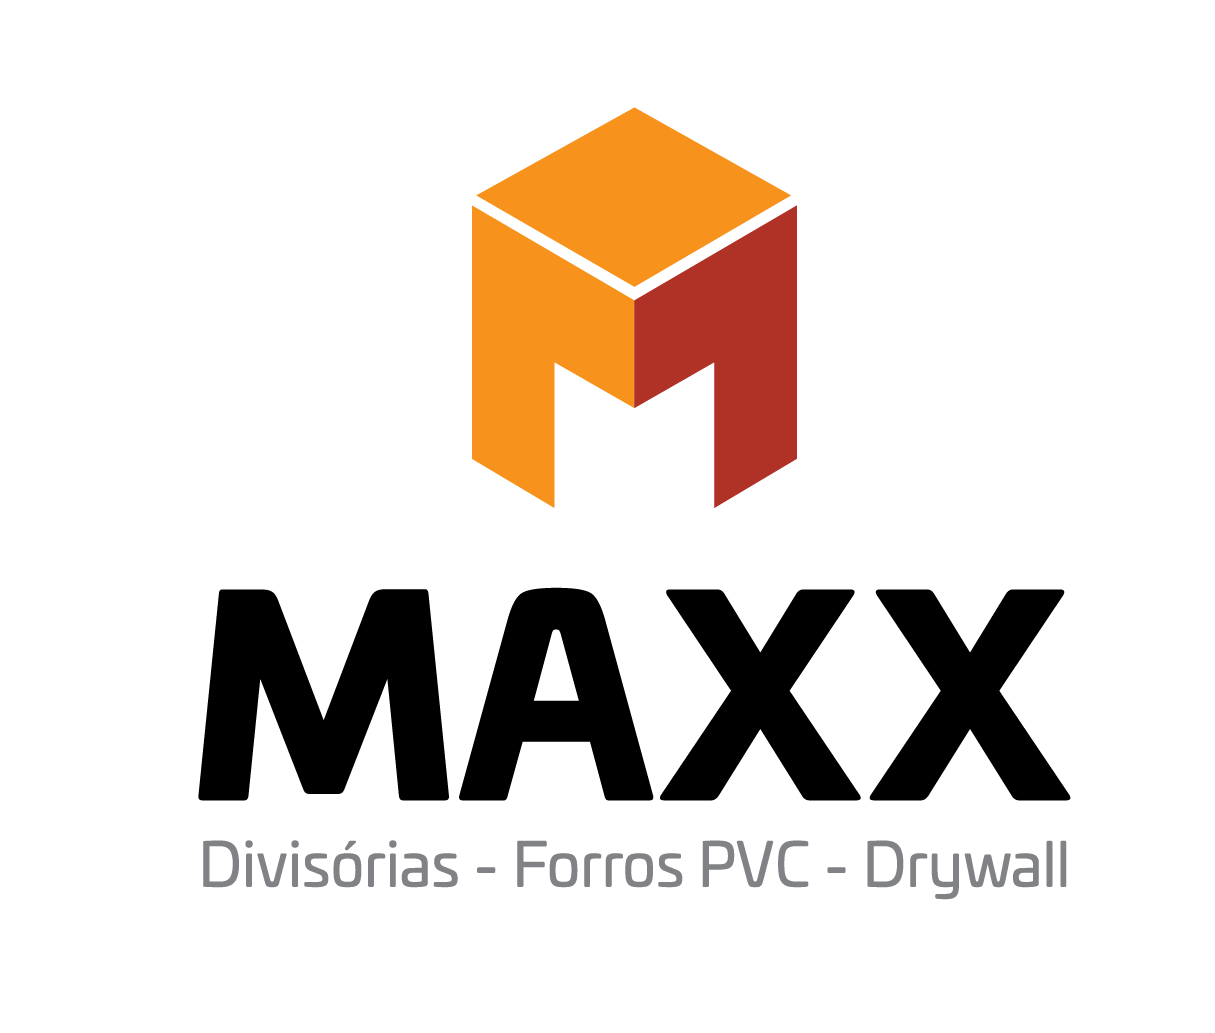 Onde Encontro Drywall para áreas Externas Parque Anhembi - Drywall para Ambiente Externo - Maxx Forro